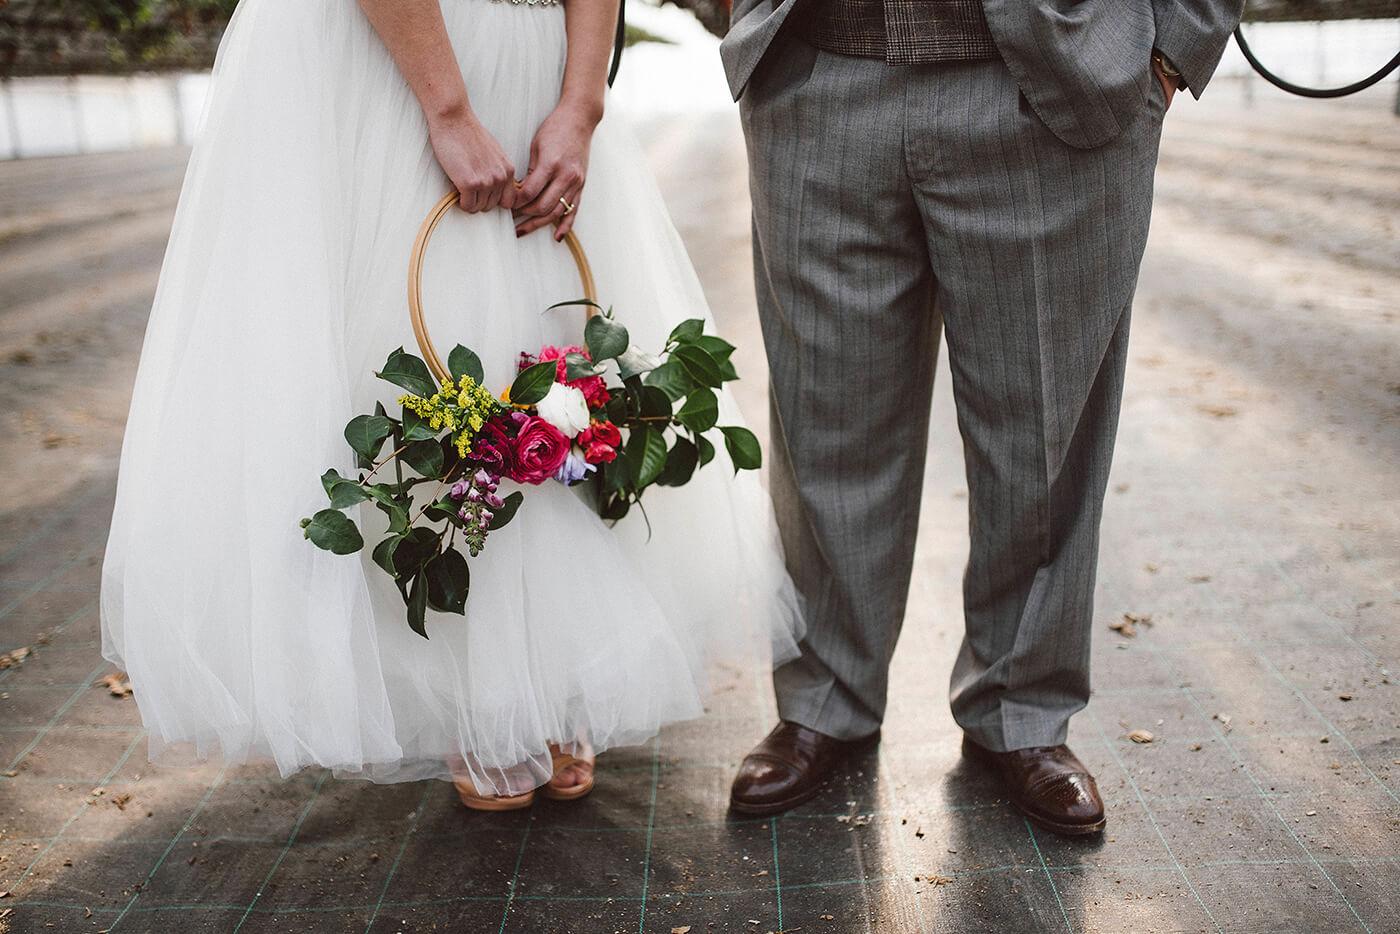 roma-organizacao-eventos-editorial-mid-century-modern-wedding-in-a-strawberry-field-15